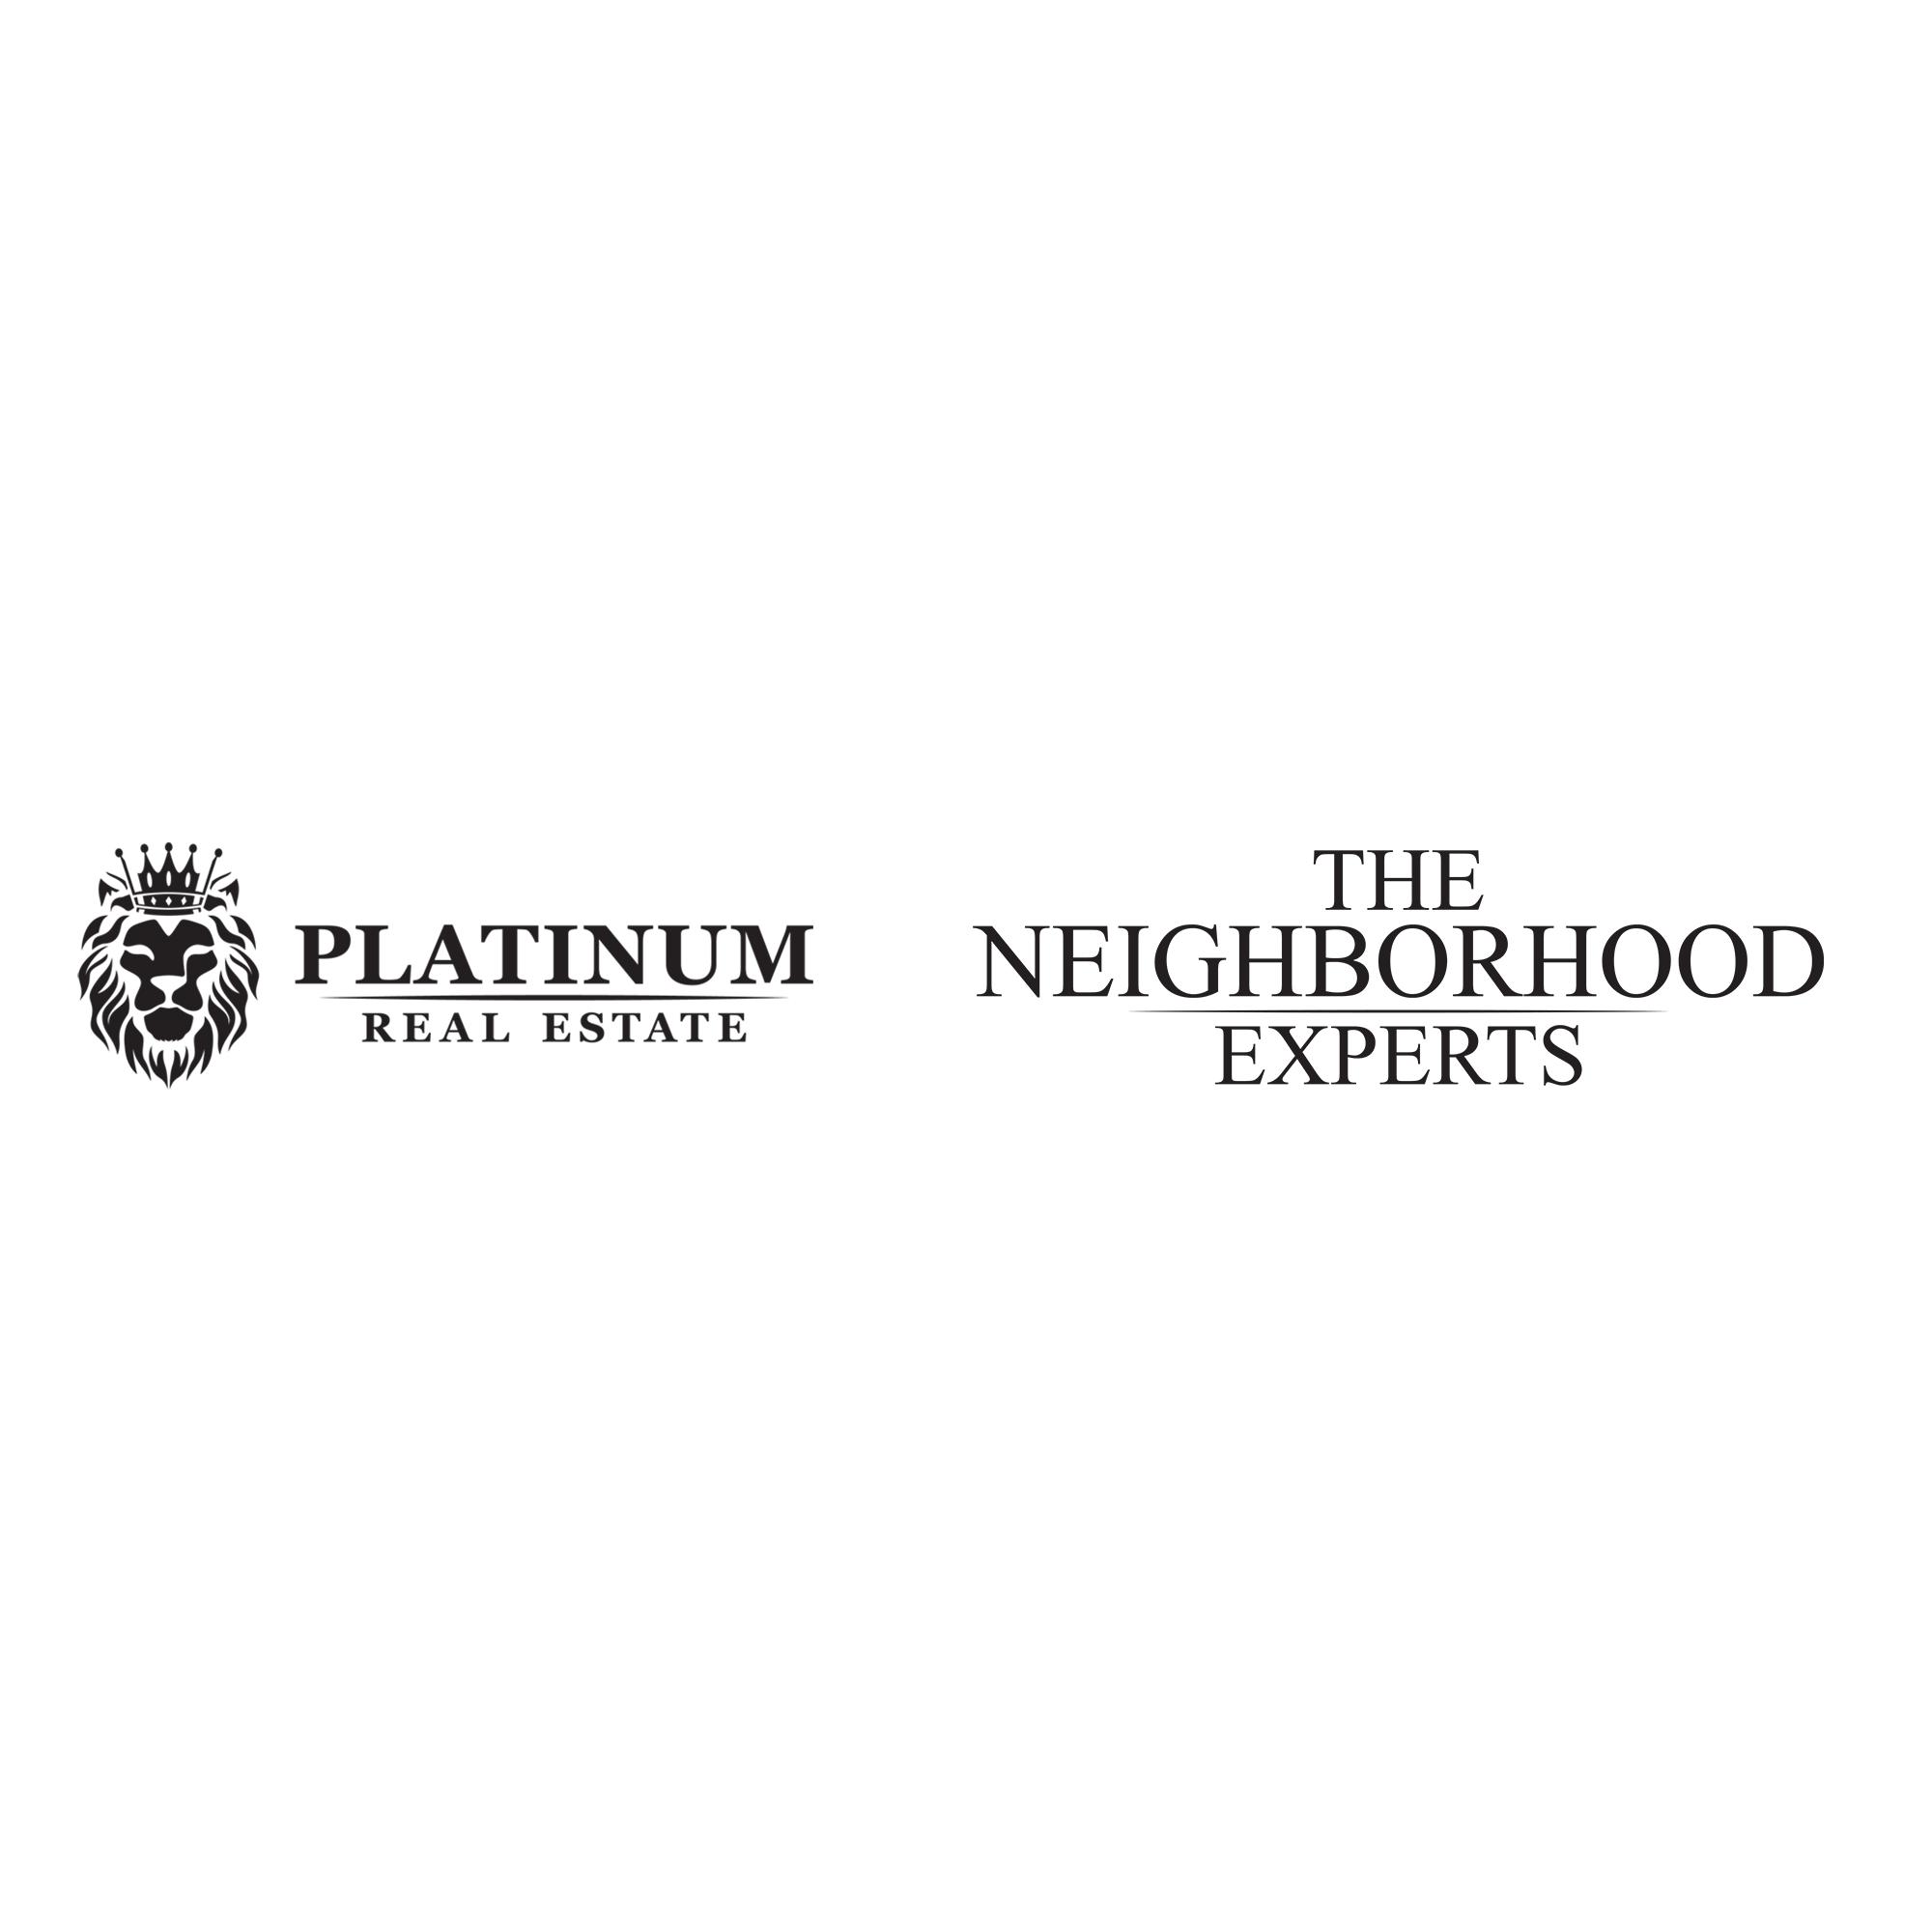 Platinum Real Estate-The Neighborhood Experts